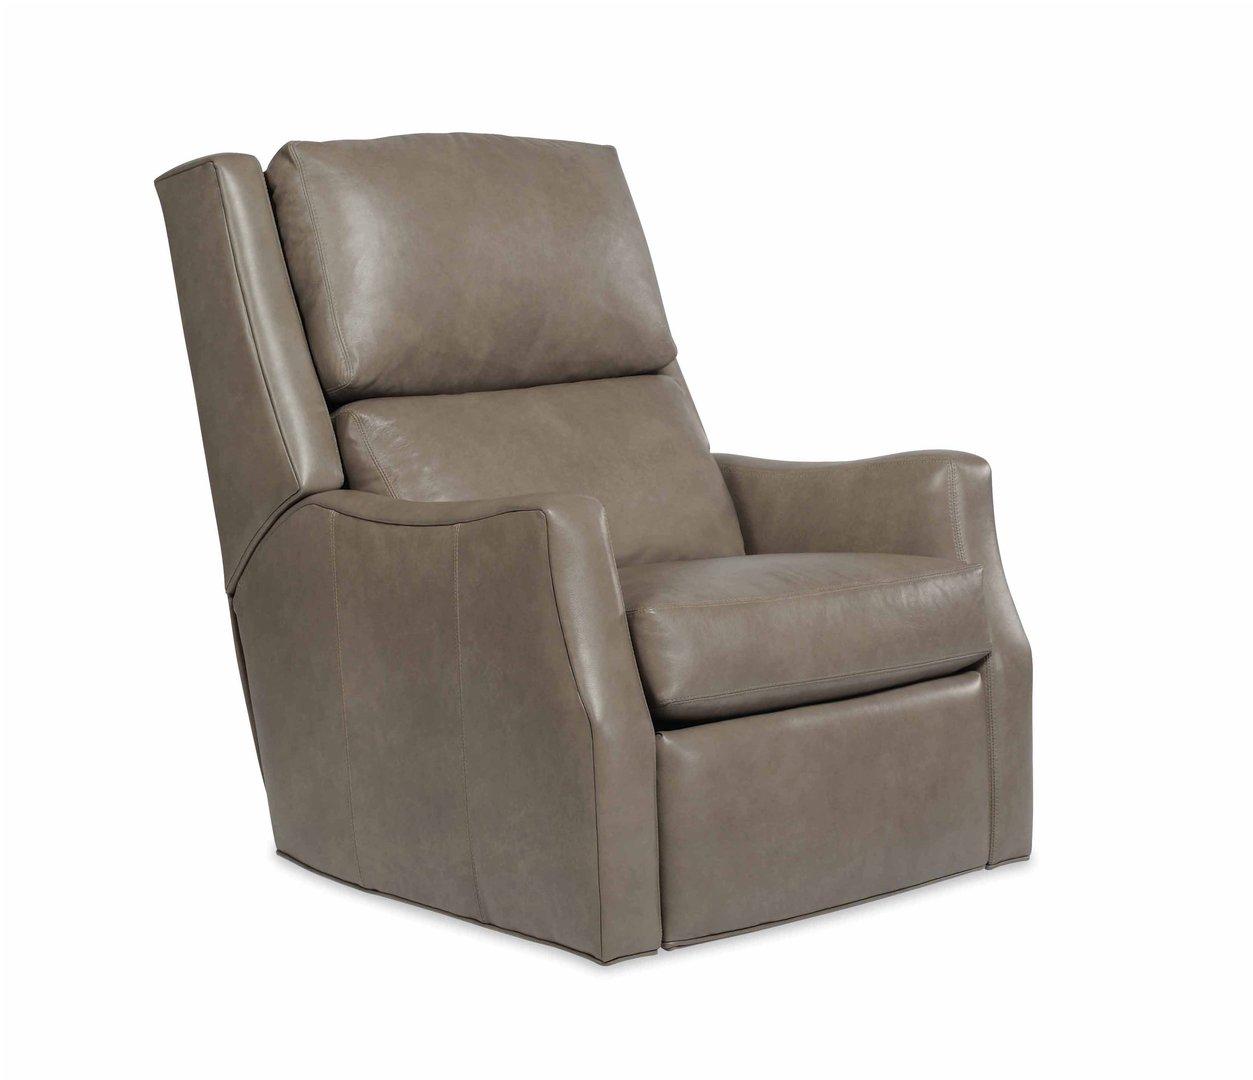 Jefferson Motorized Reclining Chair Swivel/Glider Image